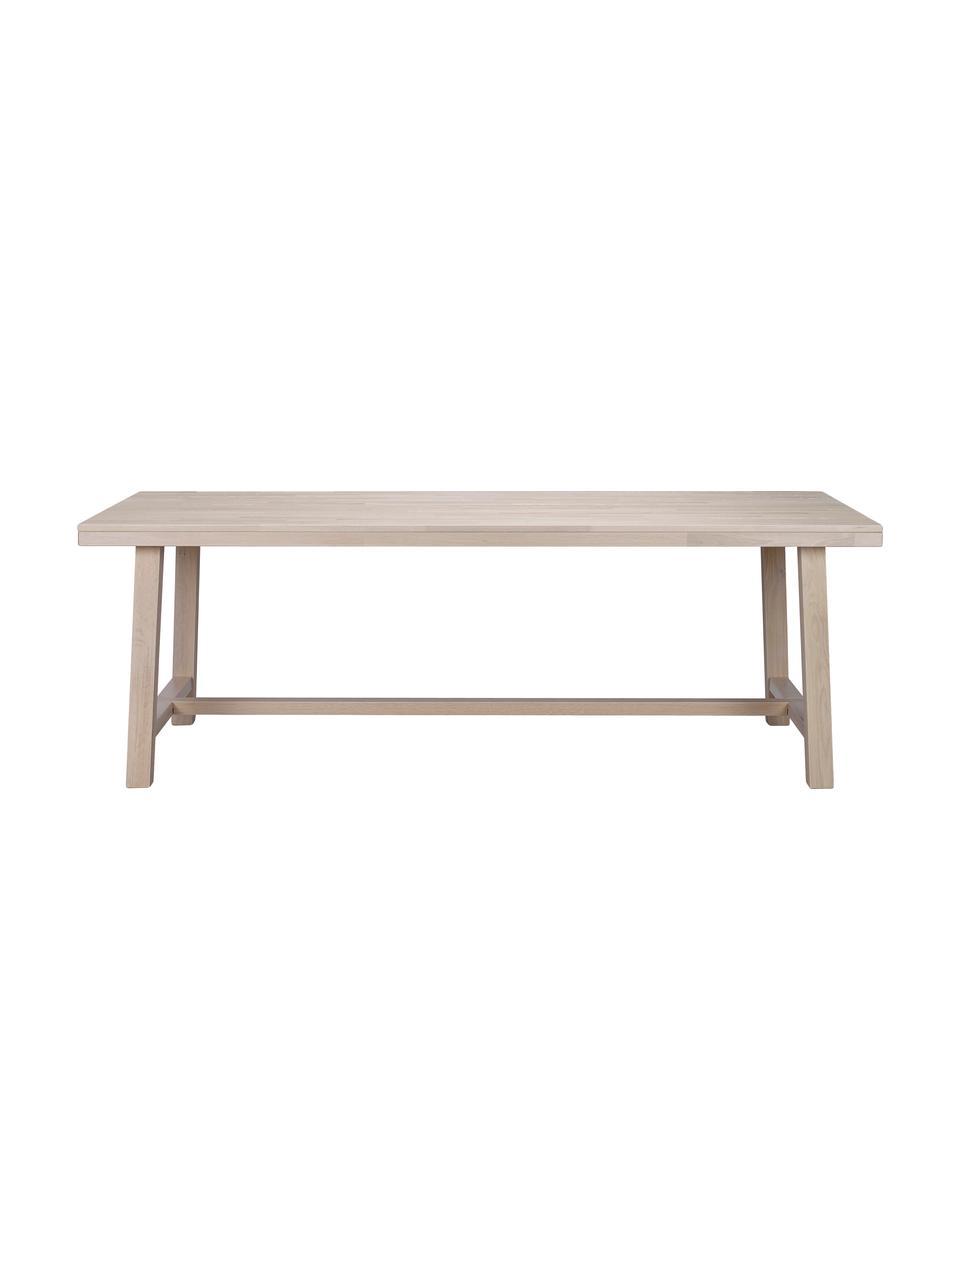 Grande table en bois massif Brooklyn, Chêne, blanc délavé